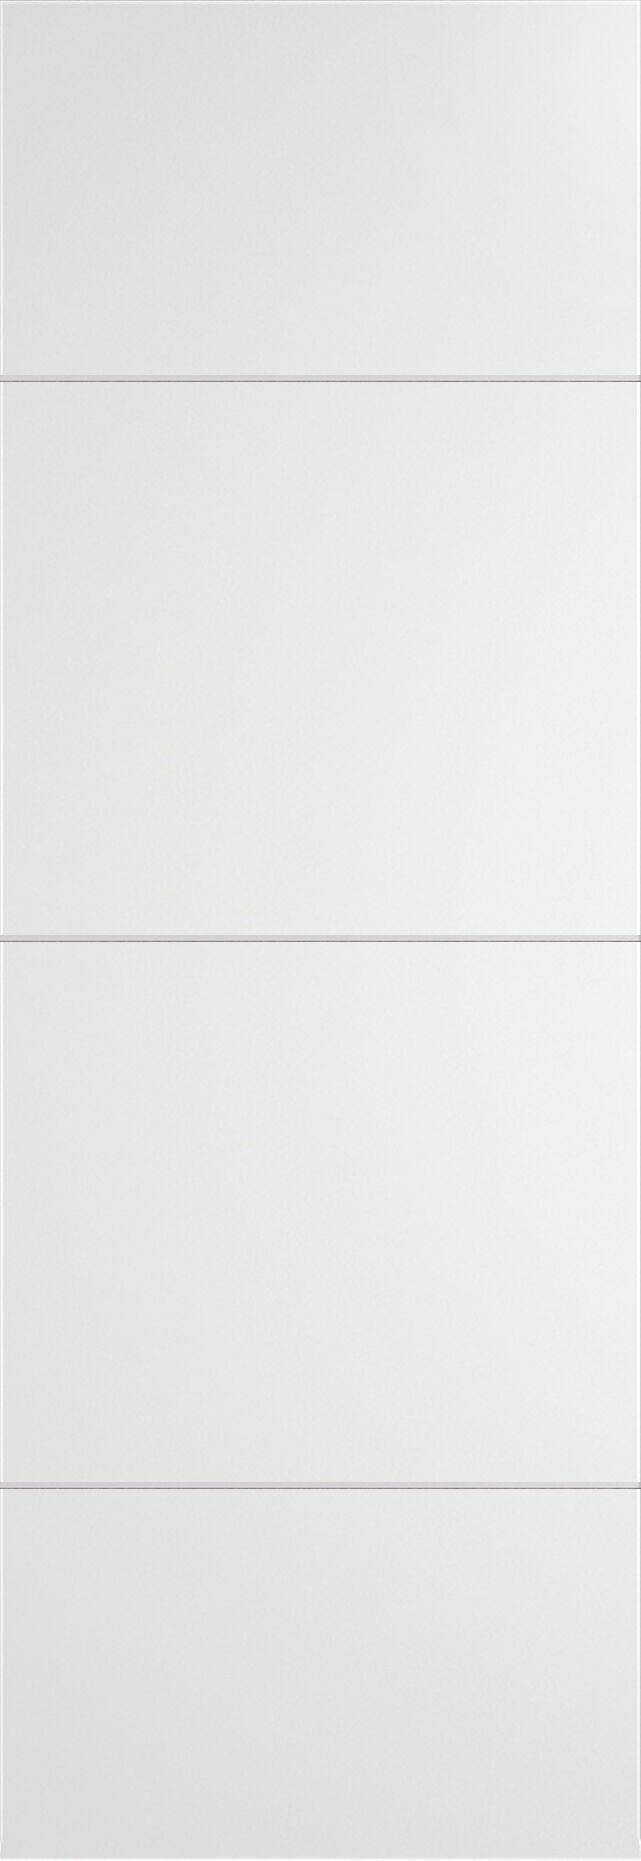 Tivoli Г-3 Invisible цвет - Белая эмаль Без стекла (ДГ)